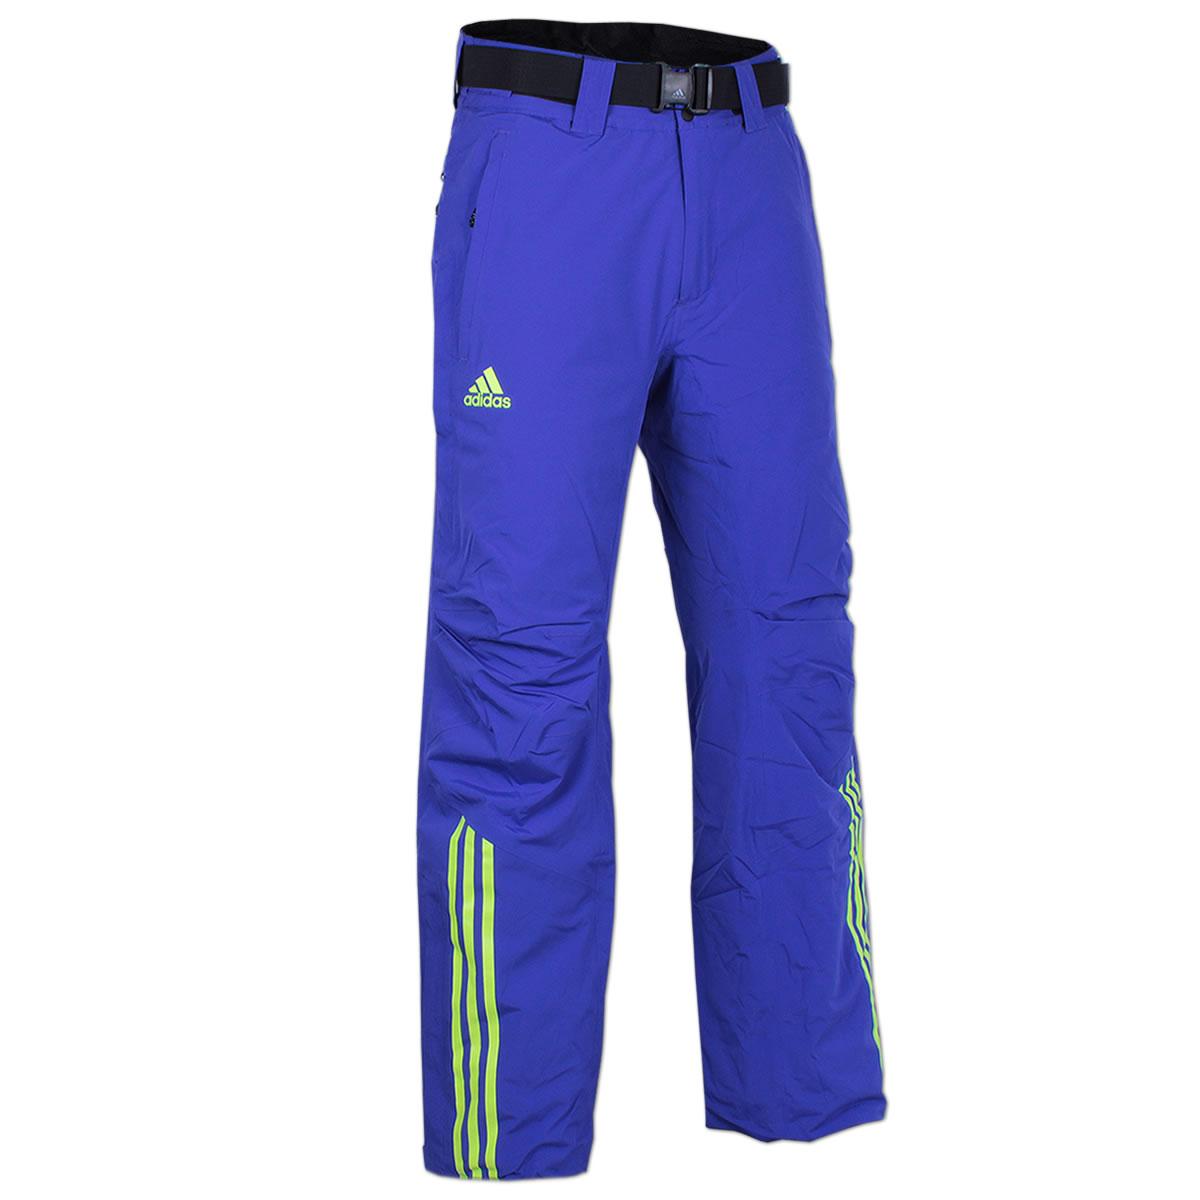 0bace3f8a98d adidas Herren Coach Pant Skihose Snowboardhose Wintersporthose Outdoorhose  blau